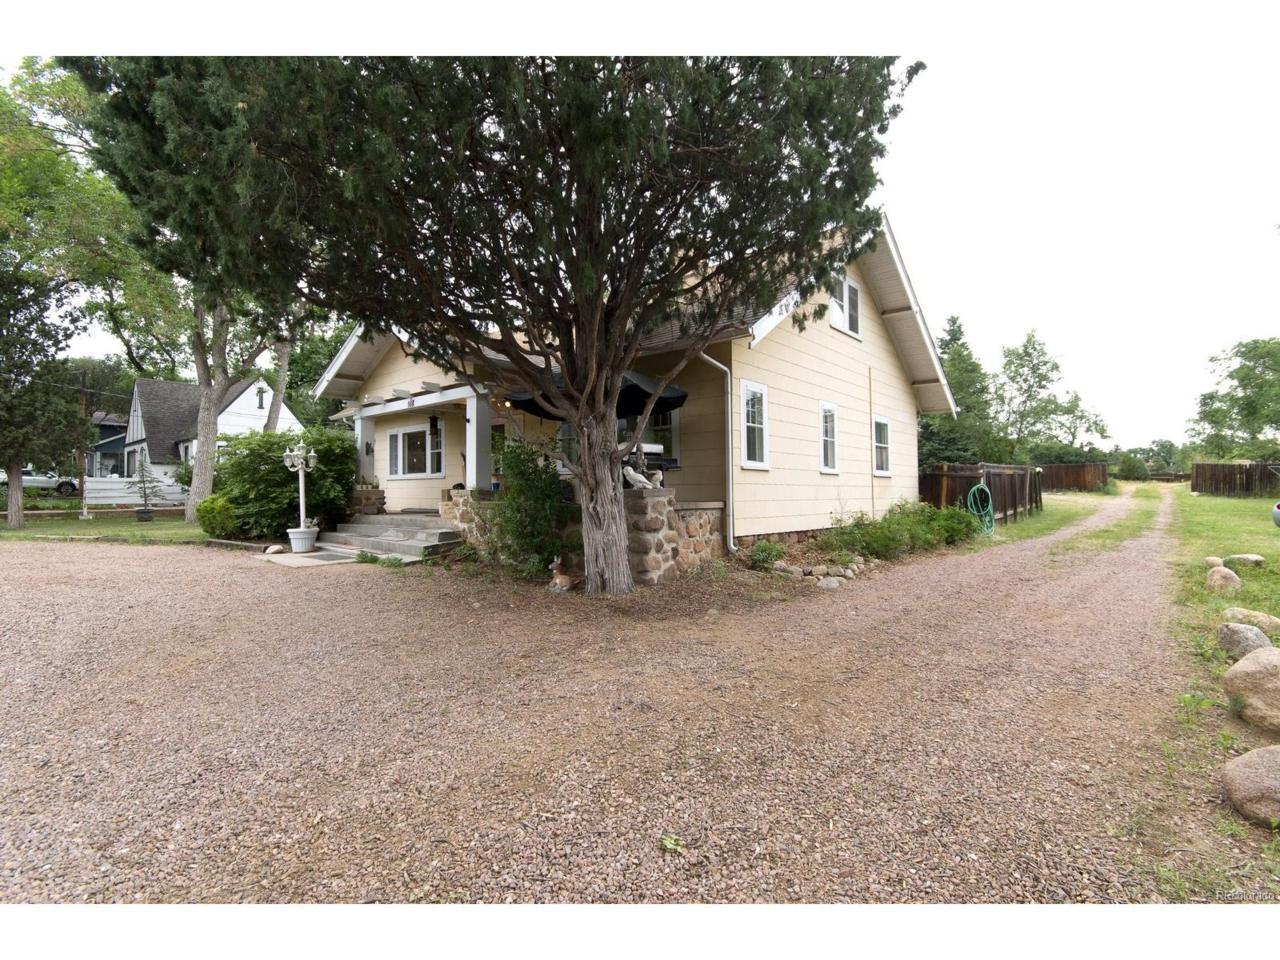 918 Cheyenne Boulevard, Colorado Springs, CO 80905 (MLS #3726060) :: 8z Real Estate